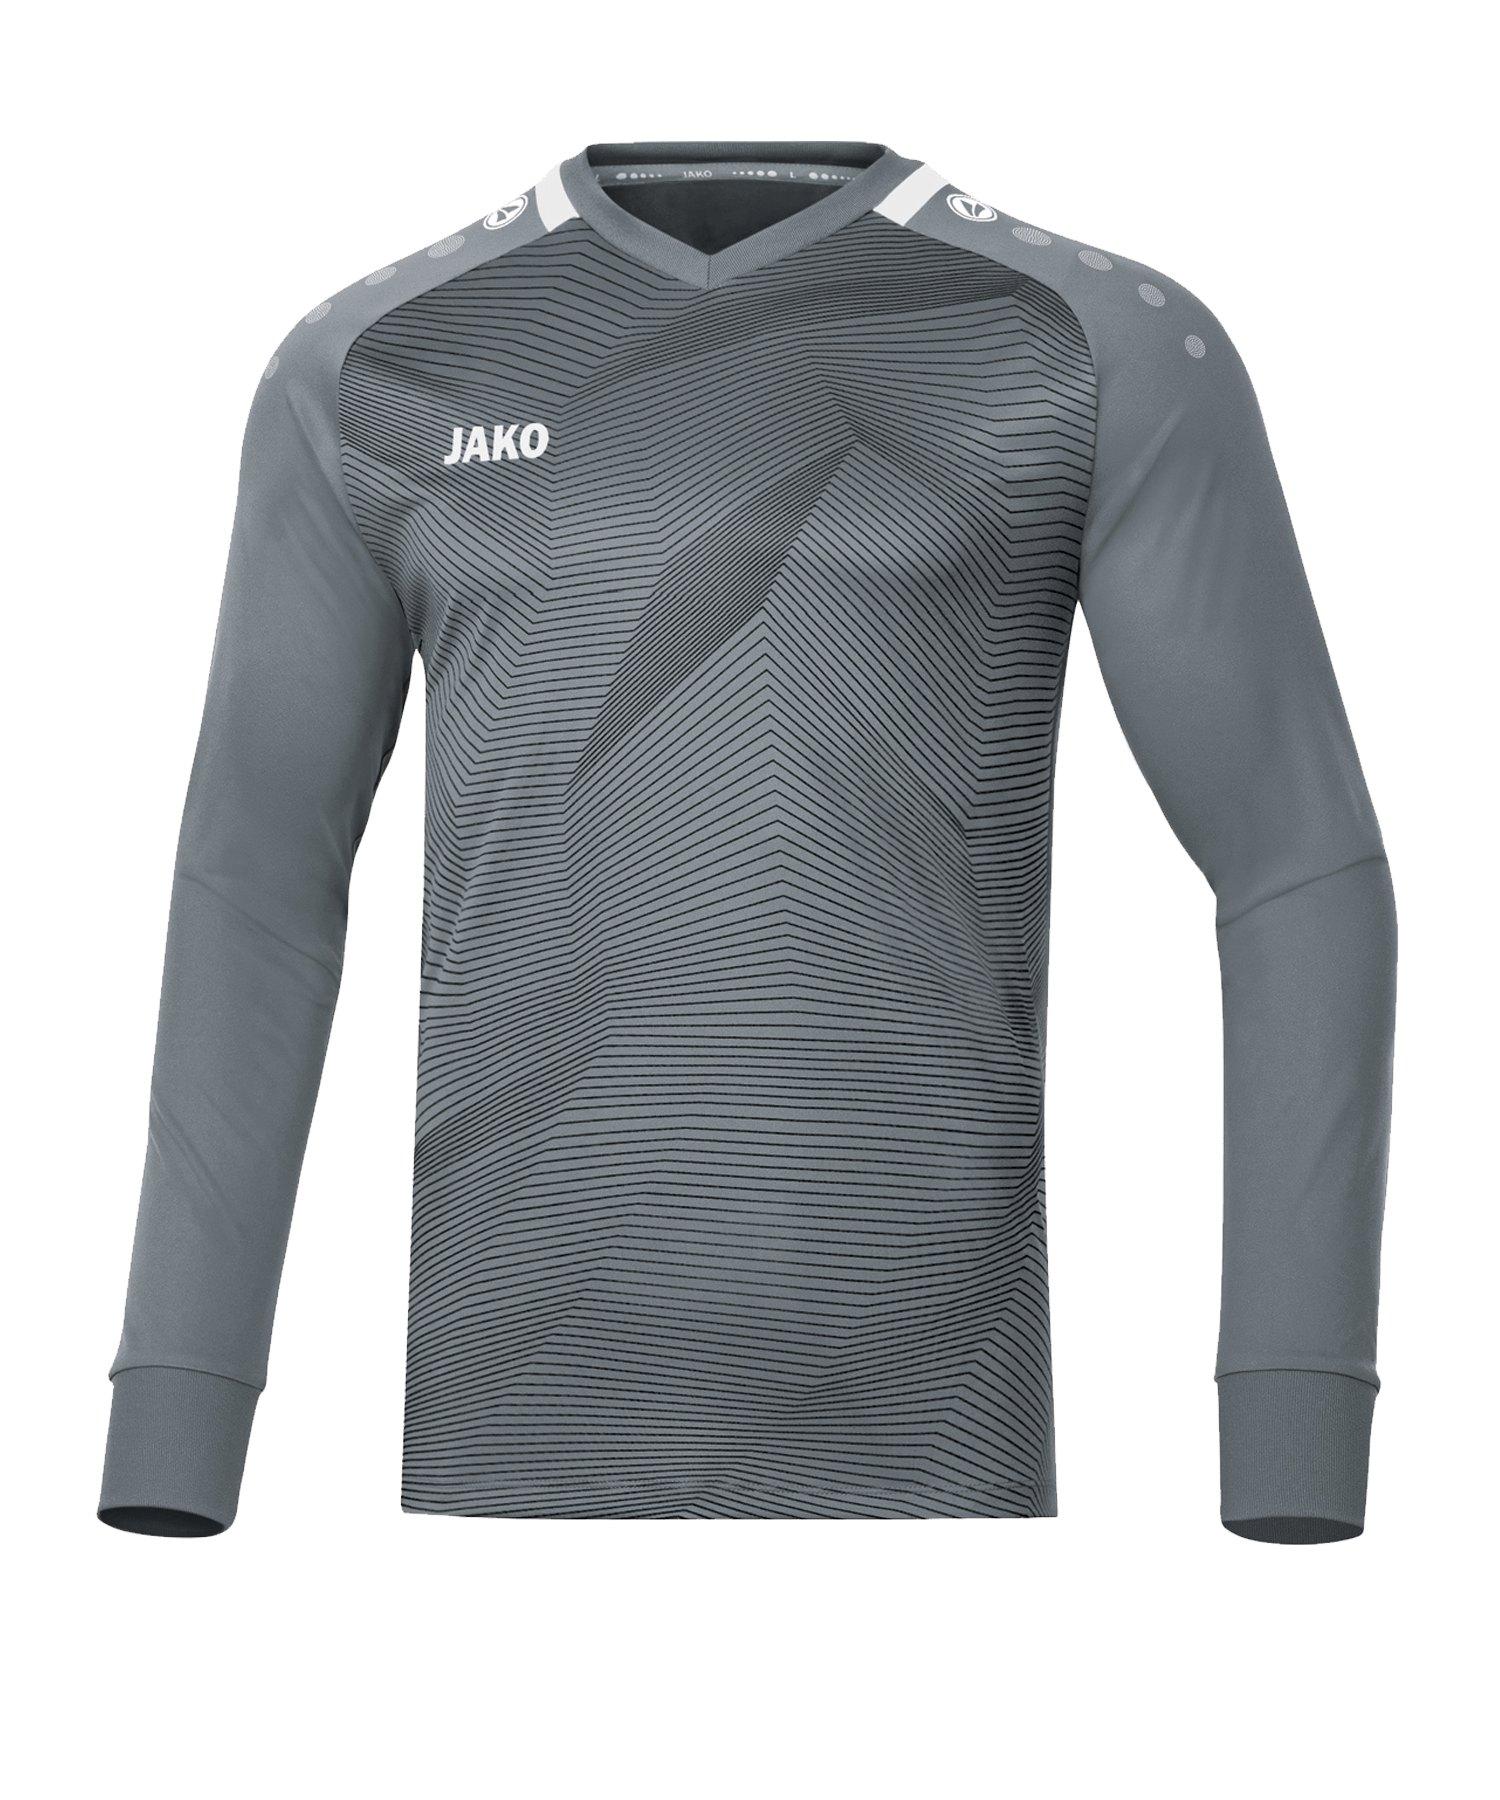 JAKO Goal Torwarttrikot Grau F40 - grau